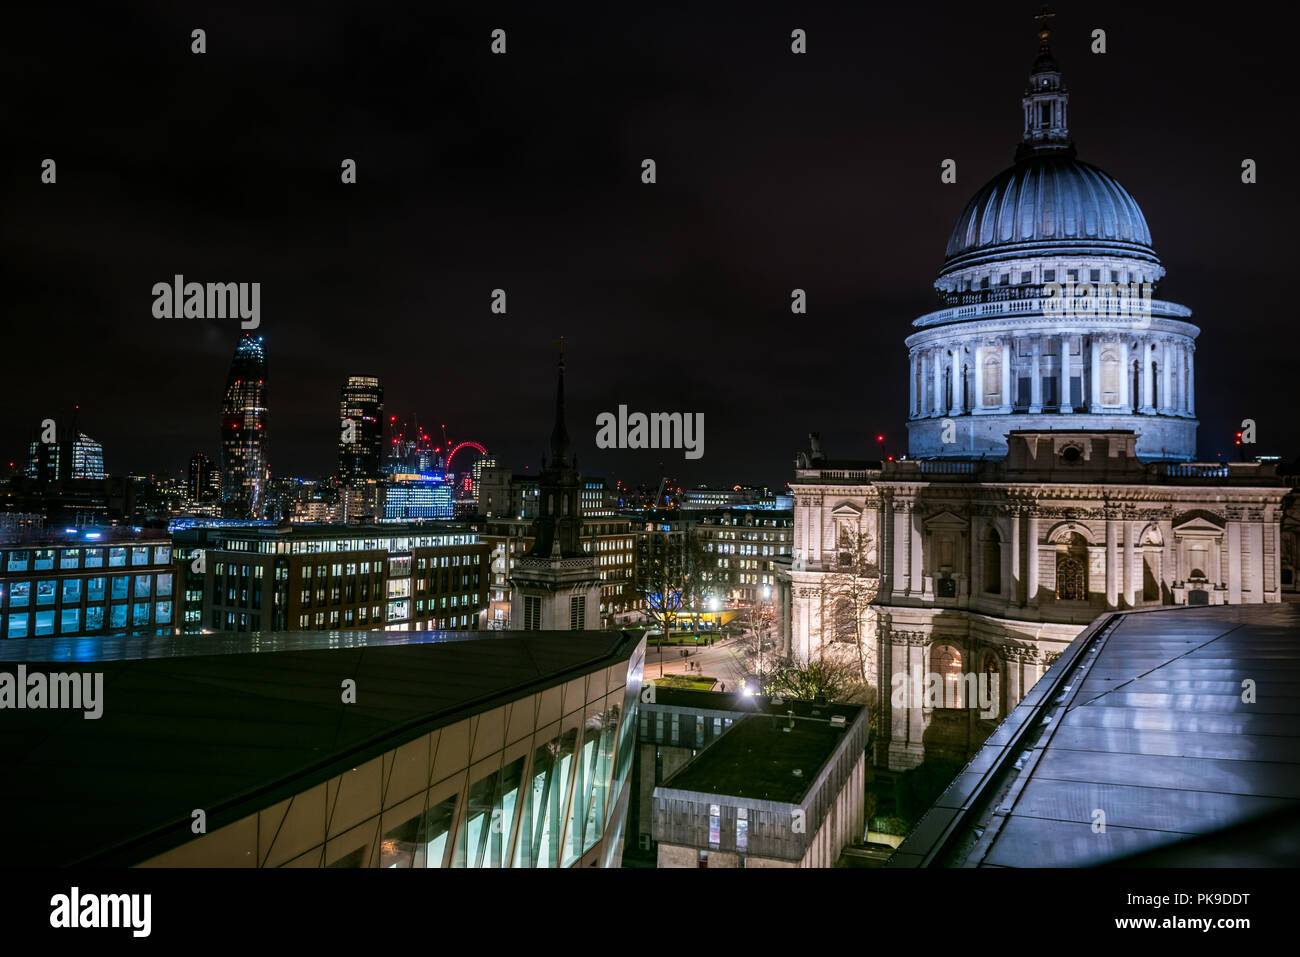 One New Change, St Pauls, London - Stock Image